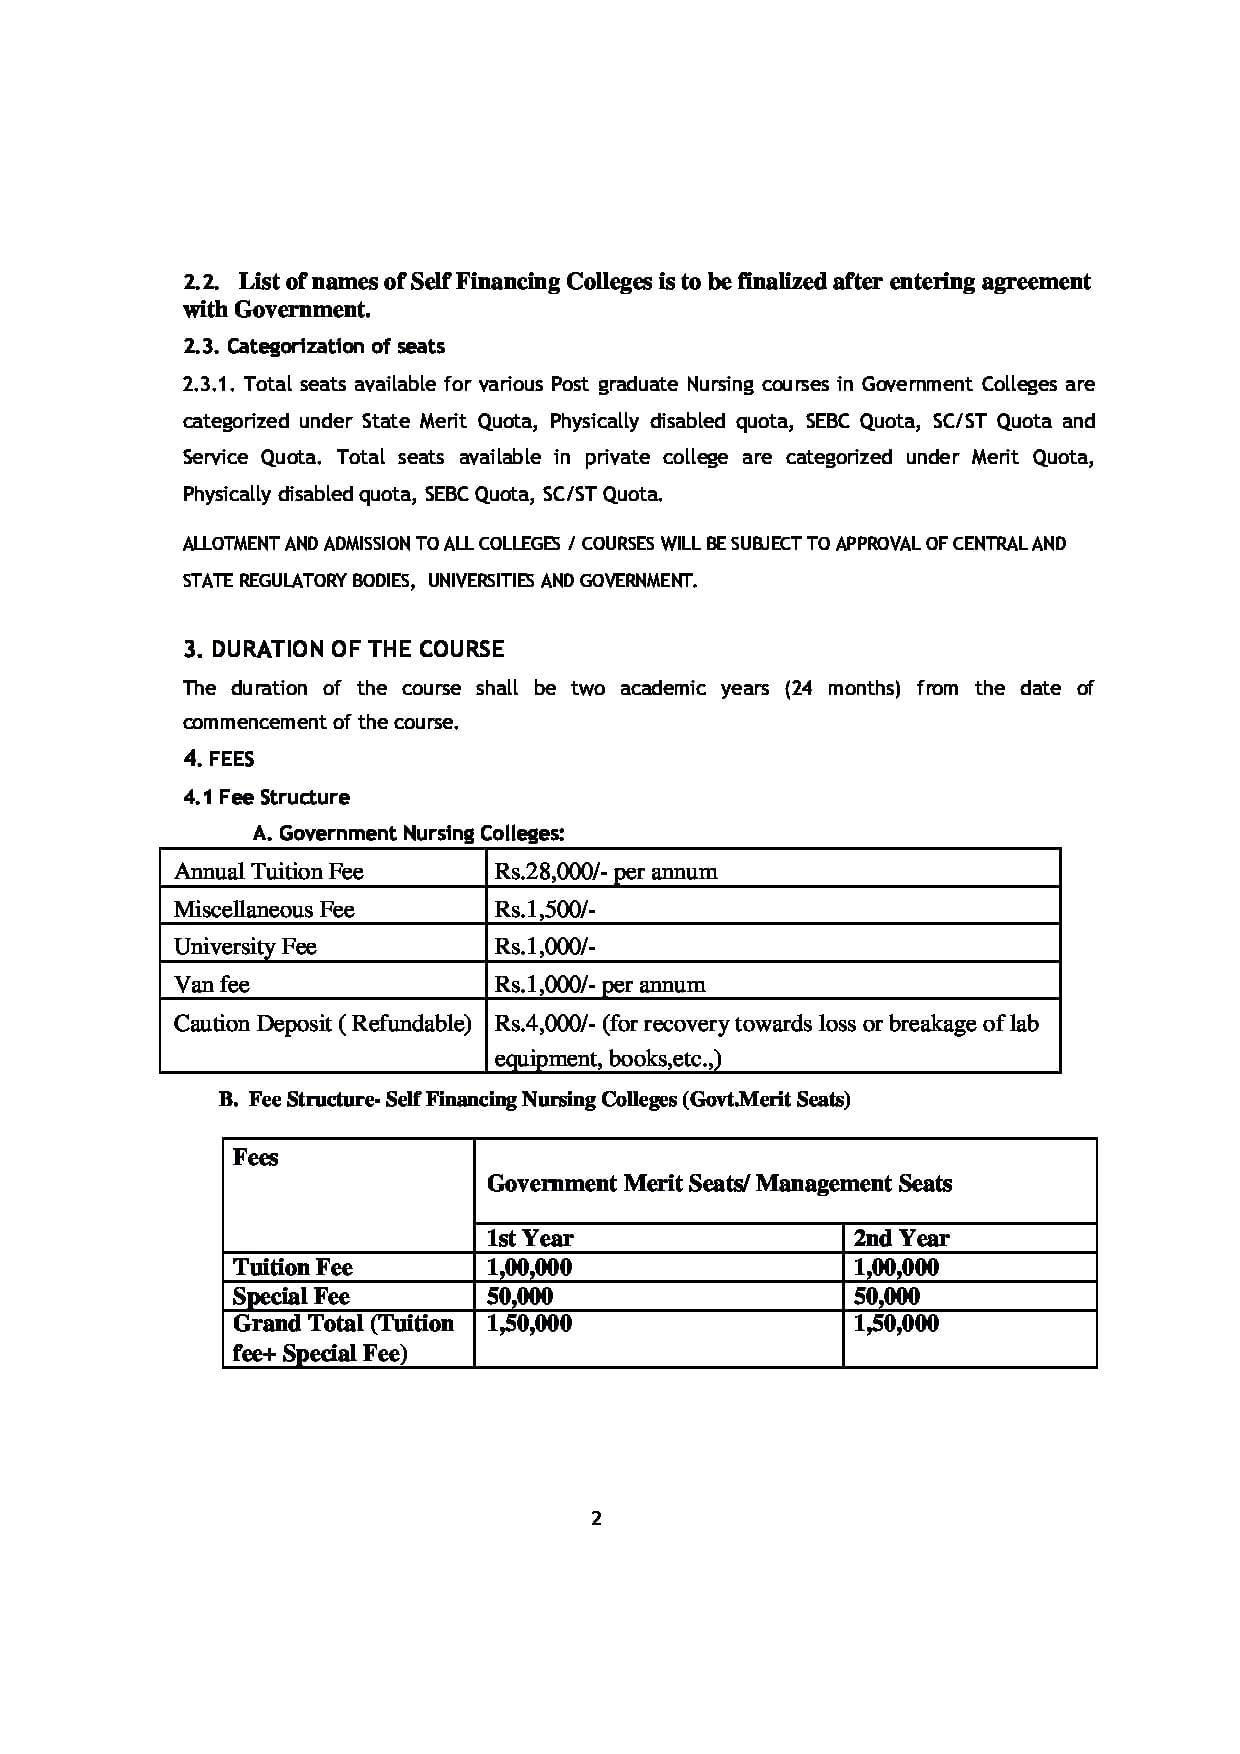 Government College of Nursing, Thiruvananthapuram - Admissions